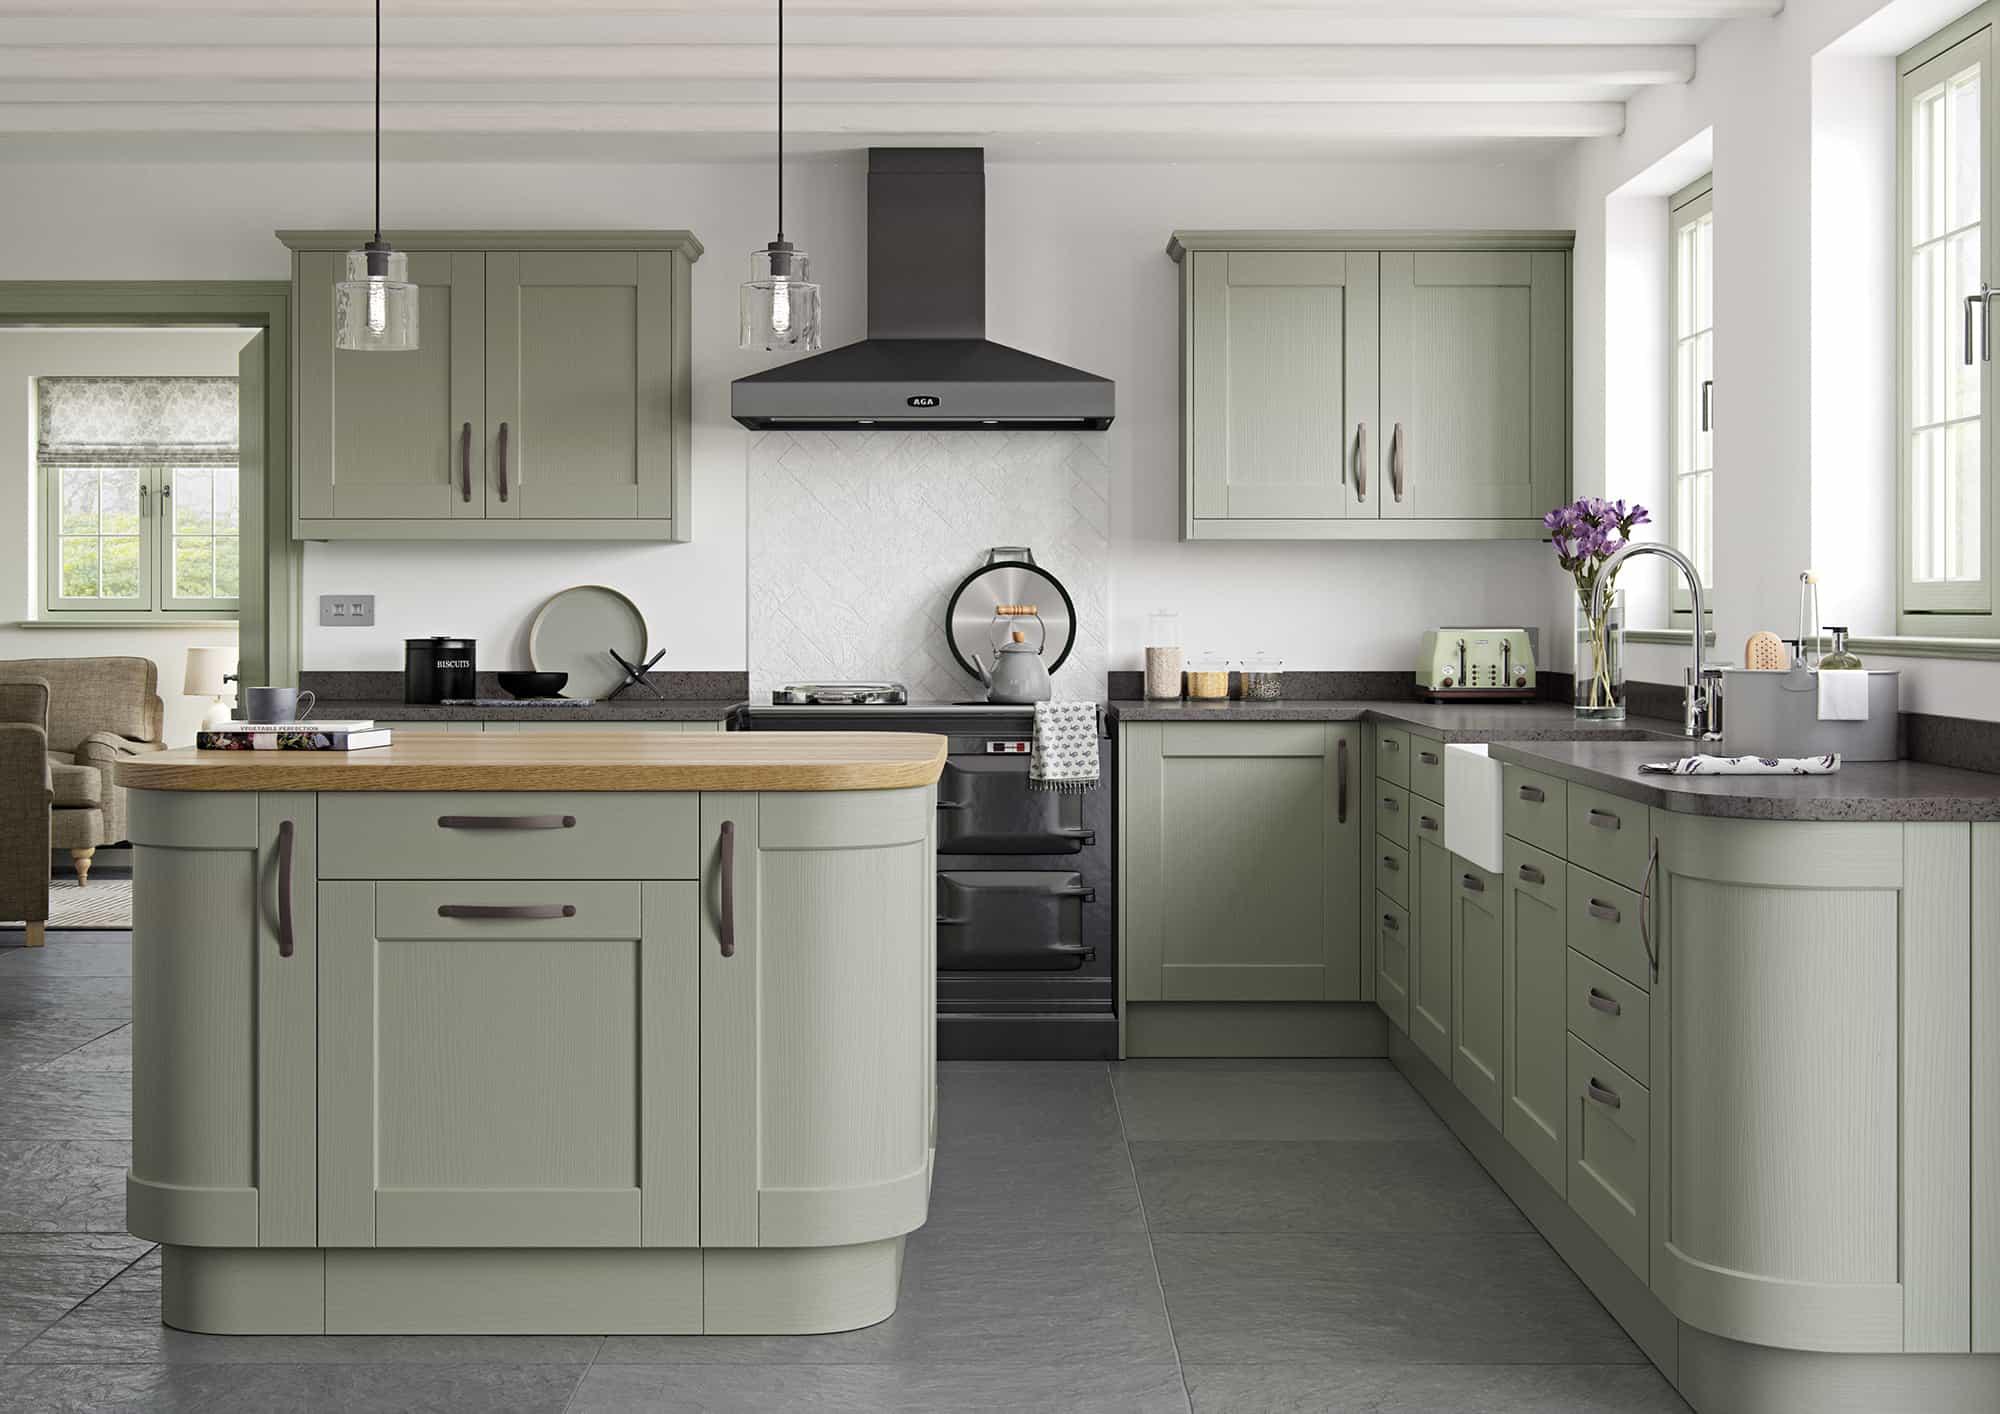 Knightsbridge Sage Green Kitchen - Alex Jane | Kitchens for Kildare, Dublin and Ireland